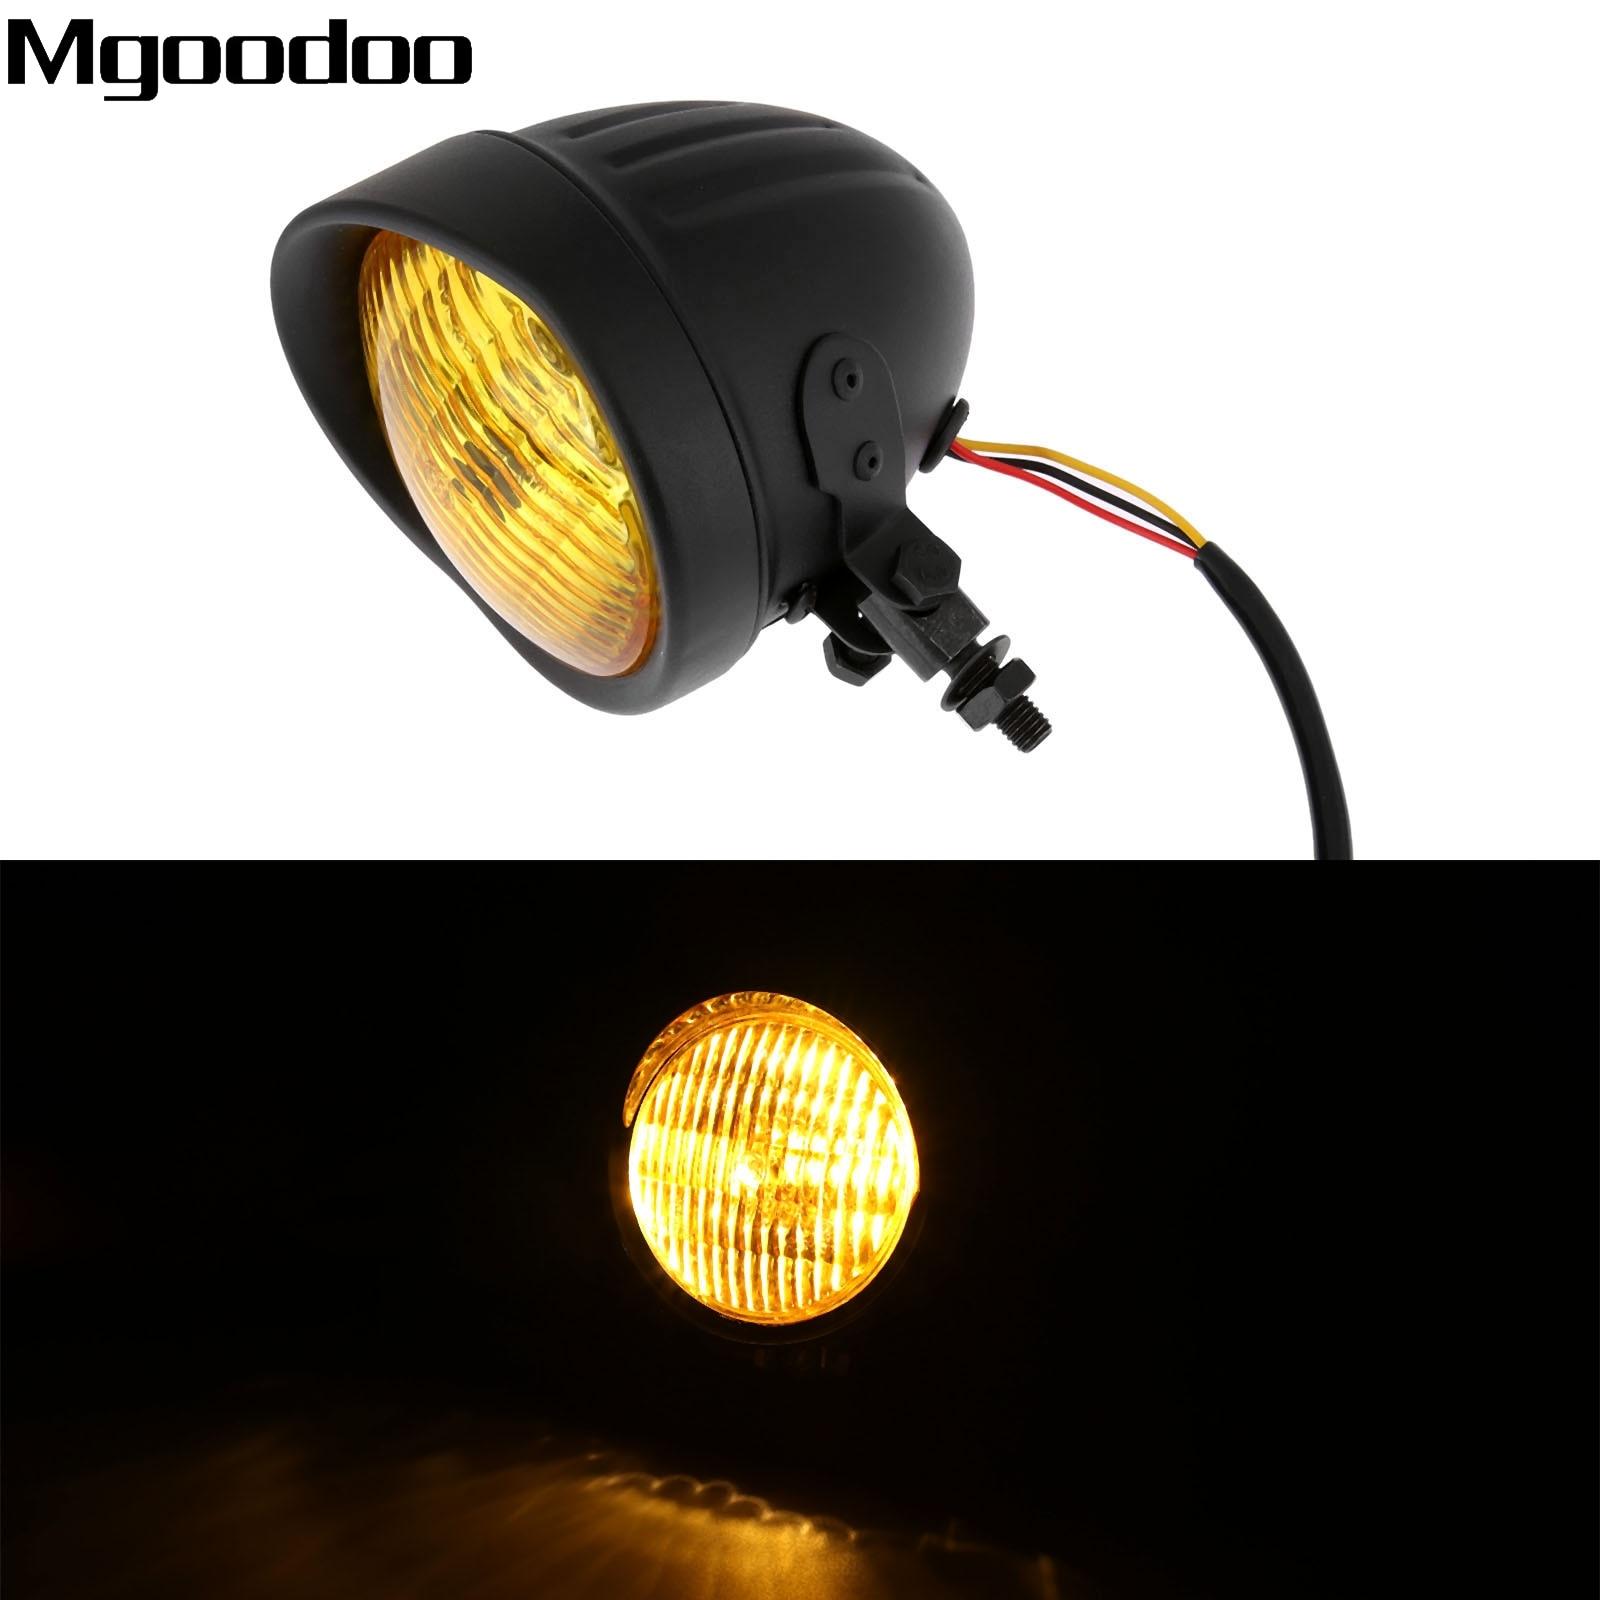 Black Motorcycle Headlight Head Light Lamp Hi/Lo Beam For Harley Bobber Choppers Touring Custom Moto Bikes 12V 35W Yellow Lense